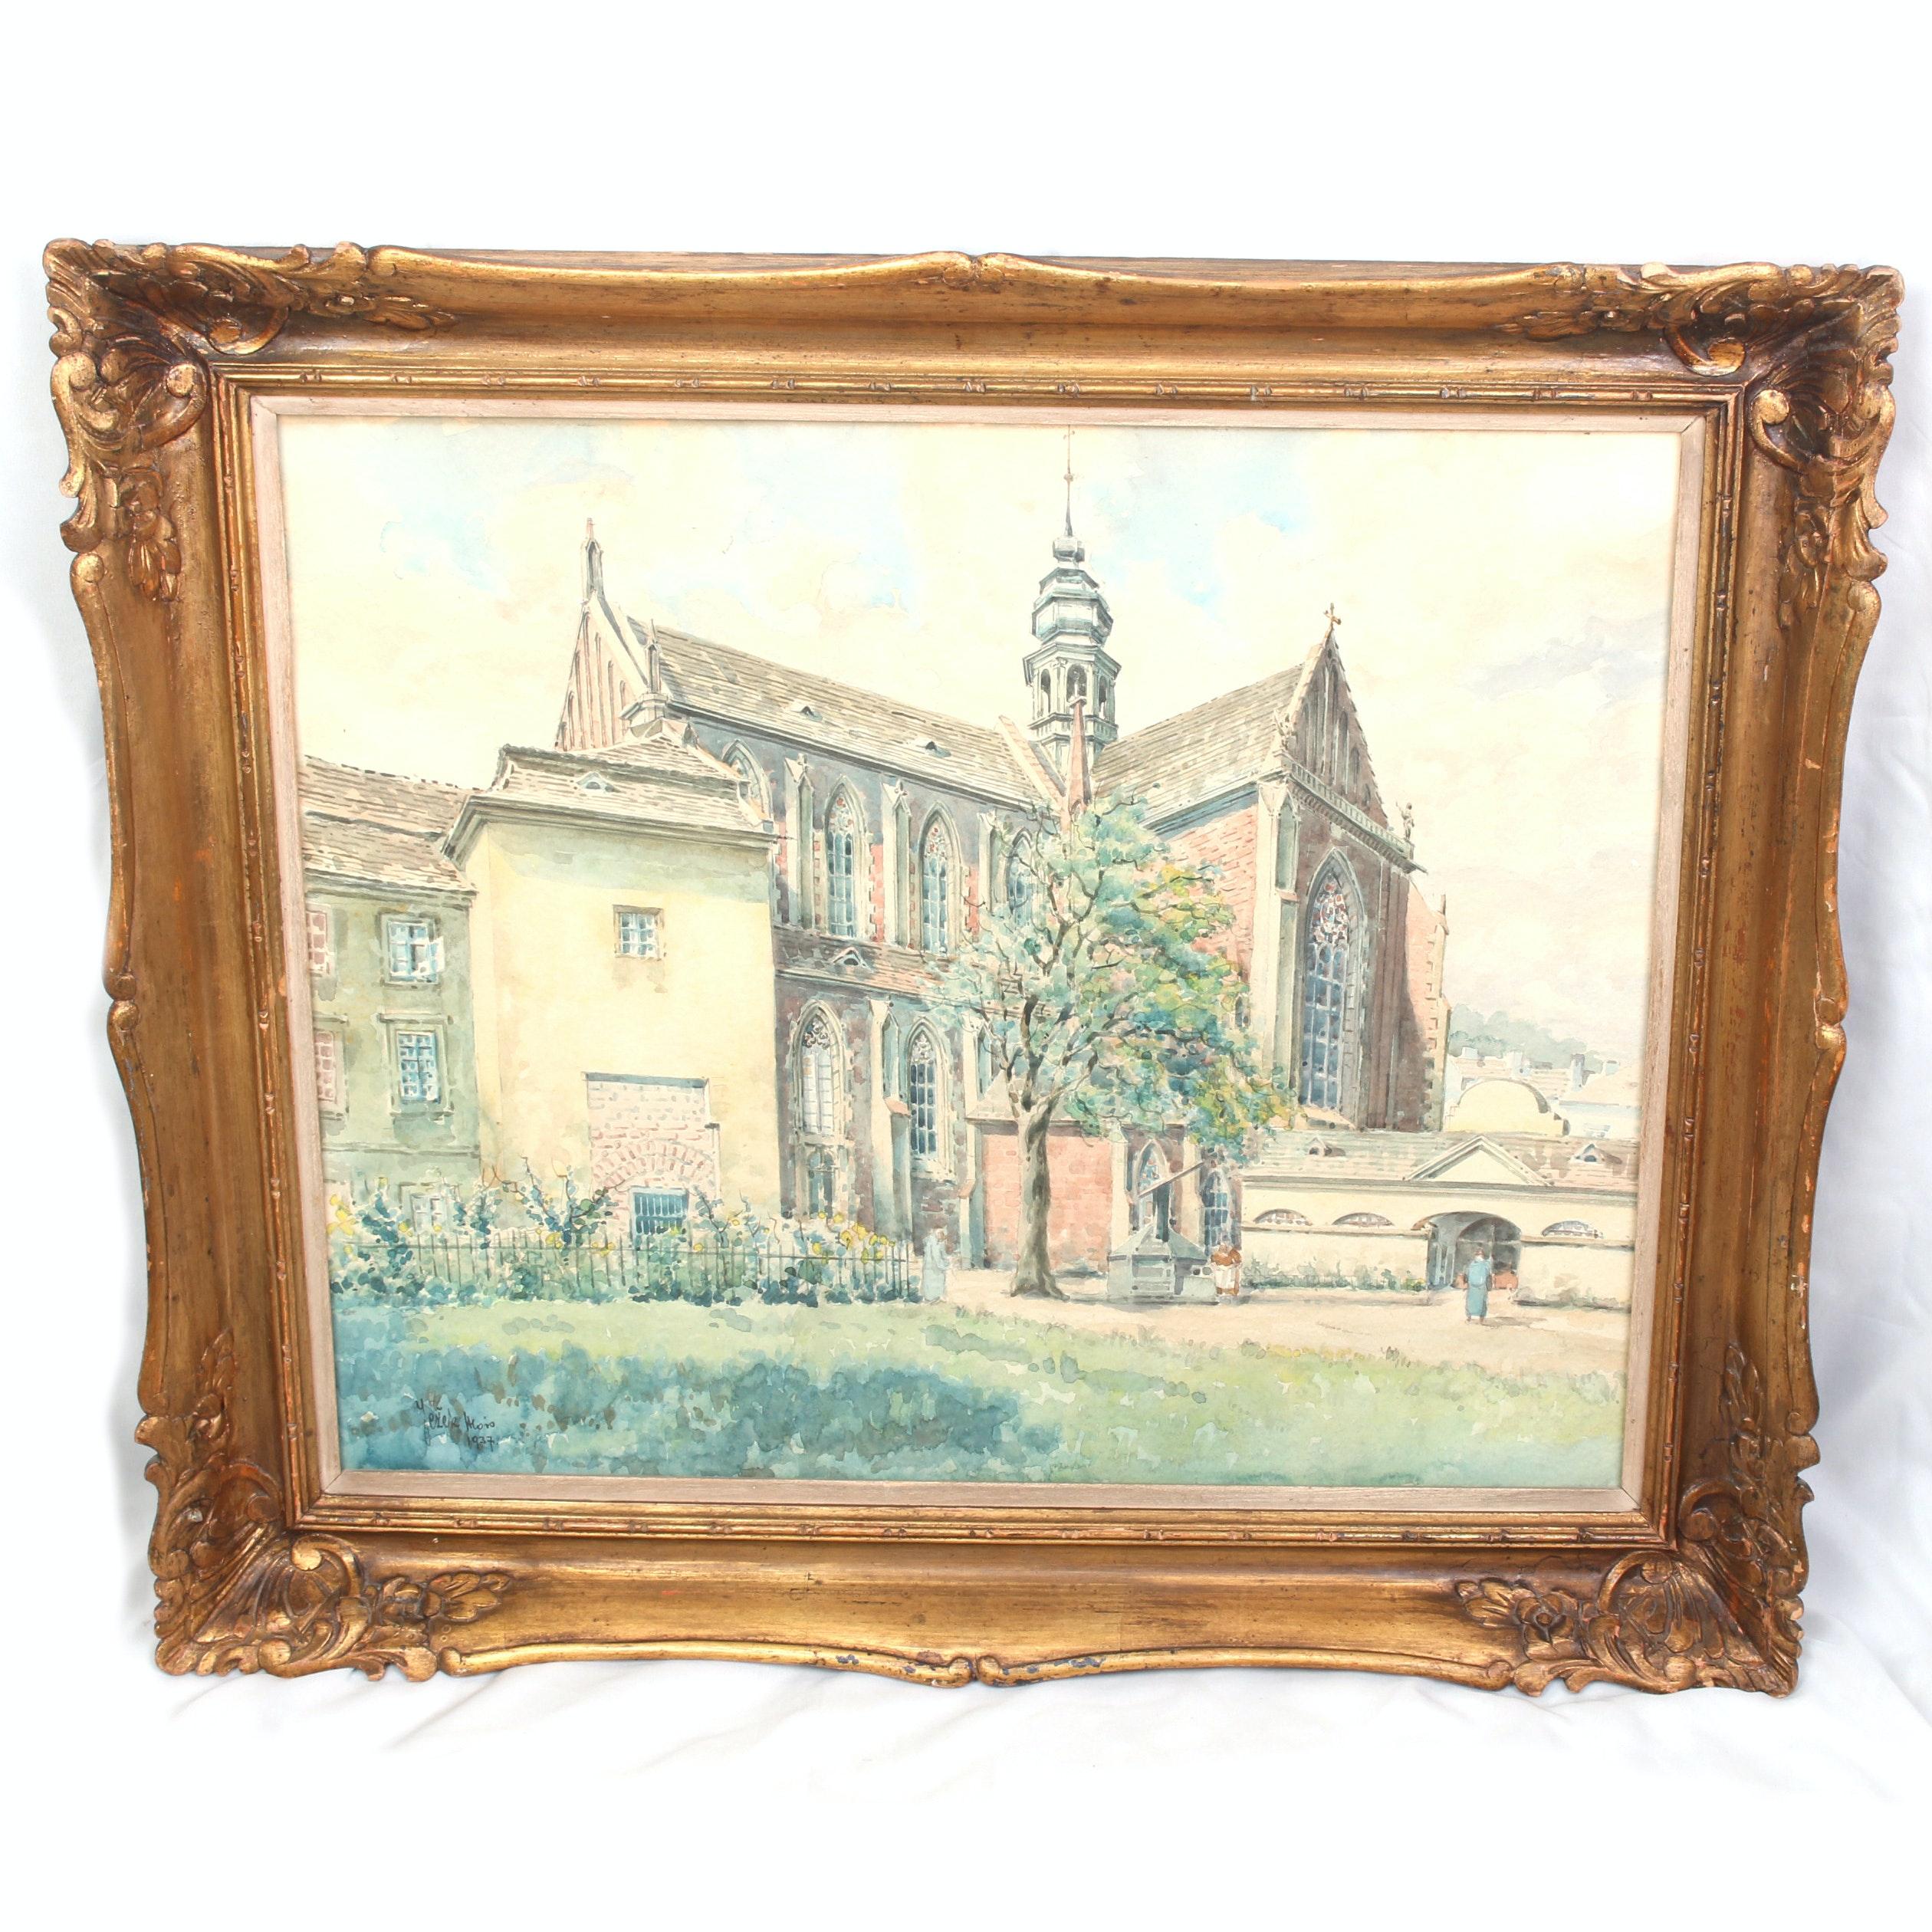 Circa 1937 Alois Jezek Original Signed Watercolor